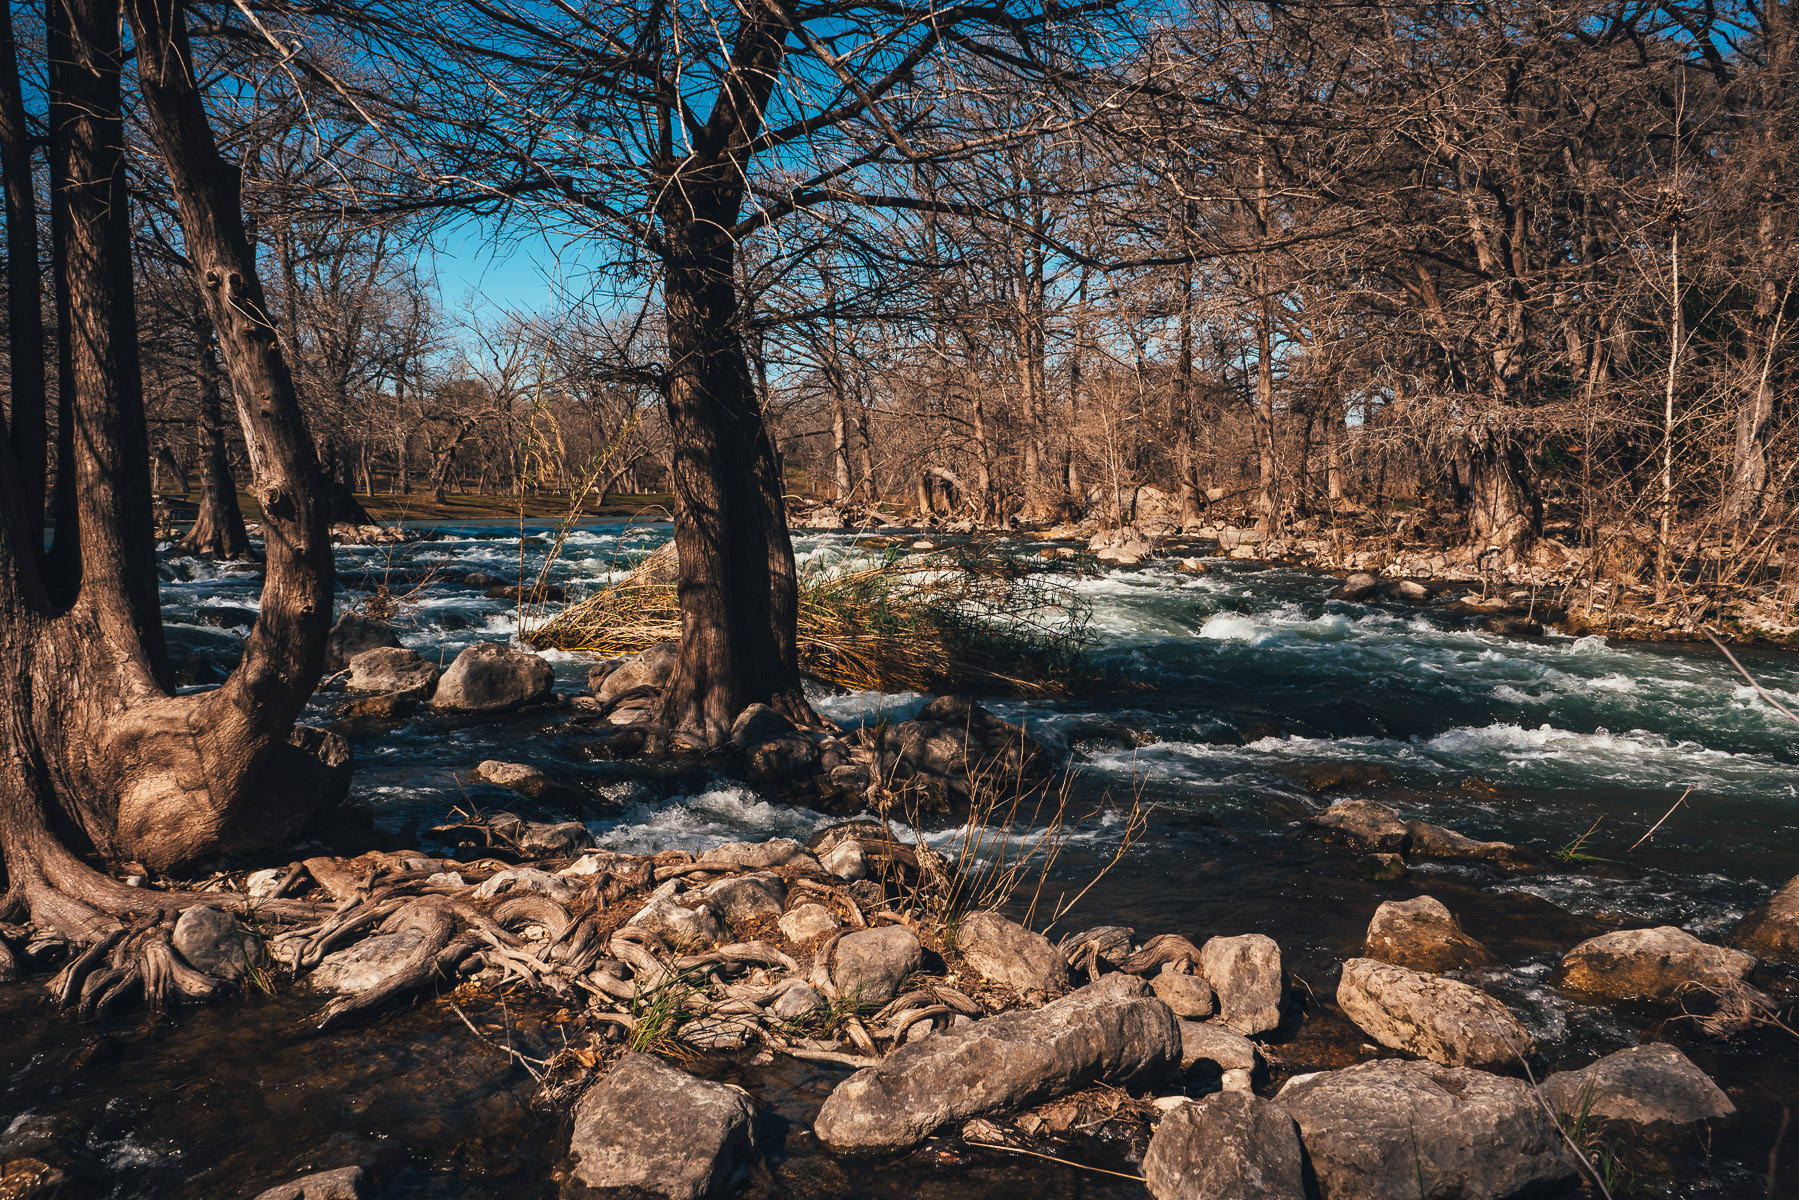 The Guadalupe River flows over rocks near Gruene, Texas.